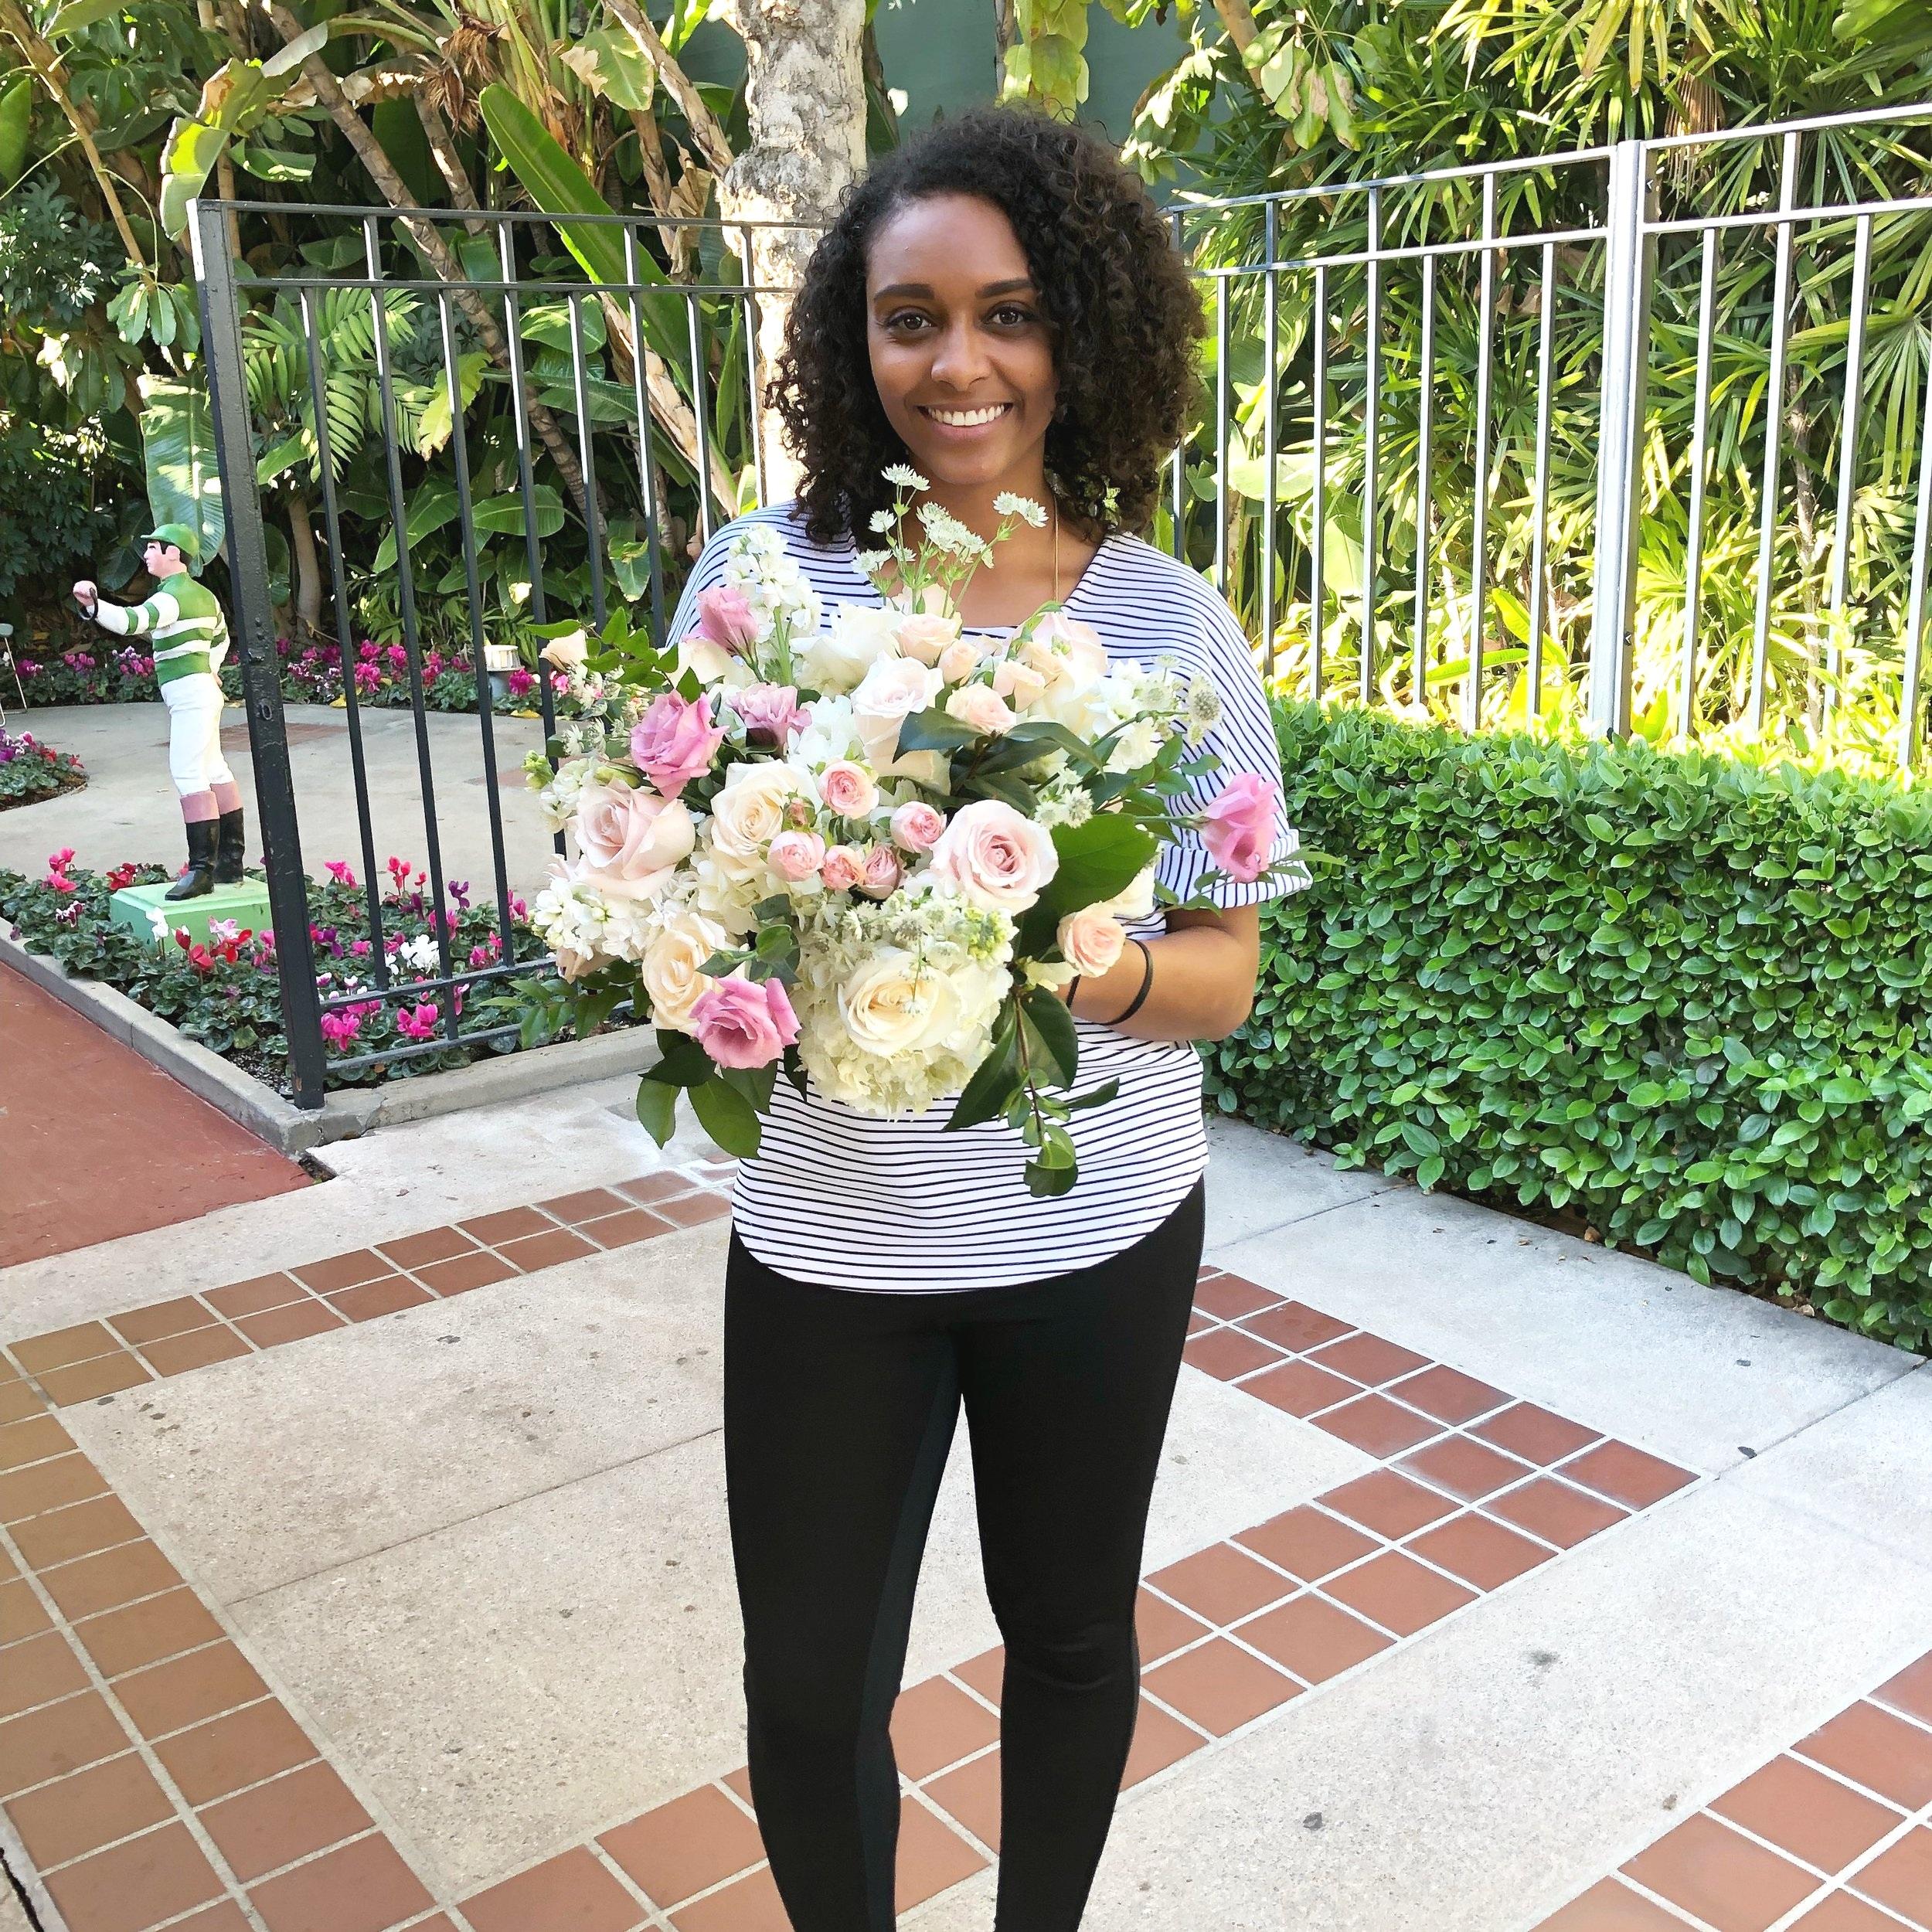 Blogging for wedding florist. - The prettiest remote job ever.